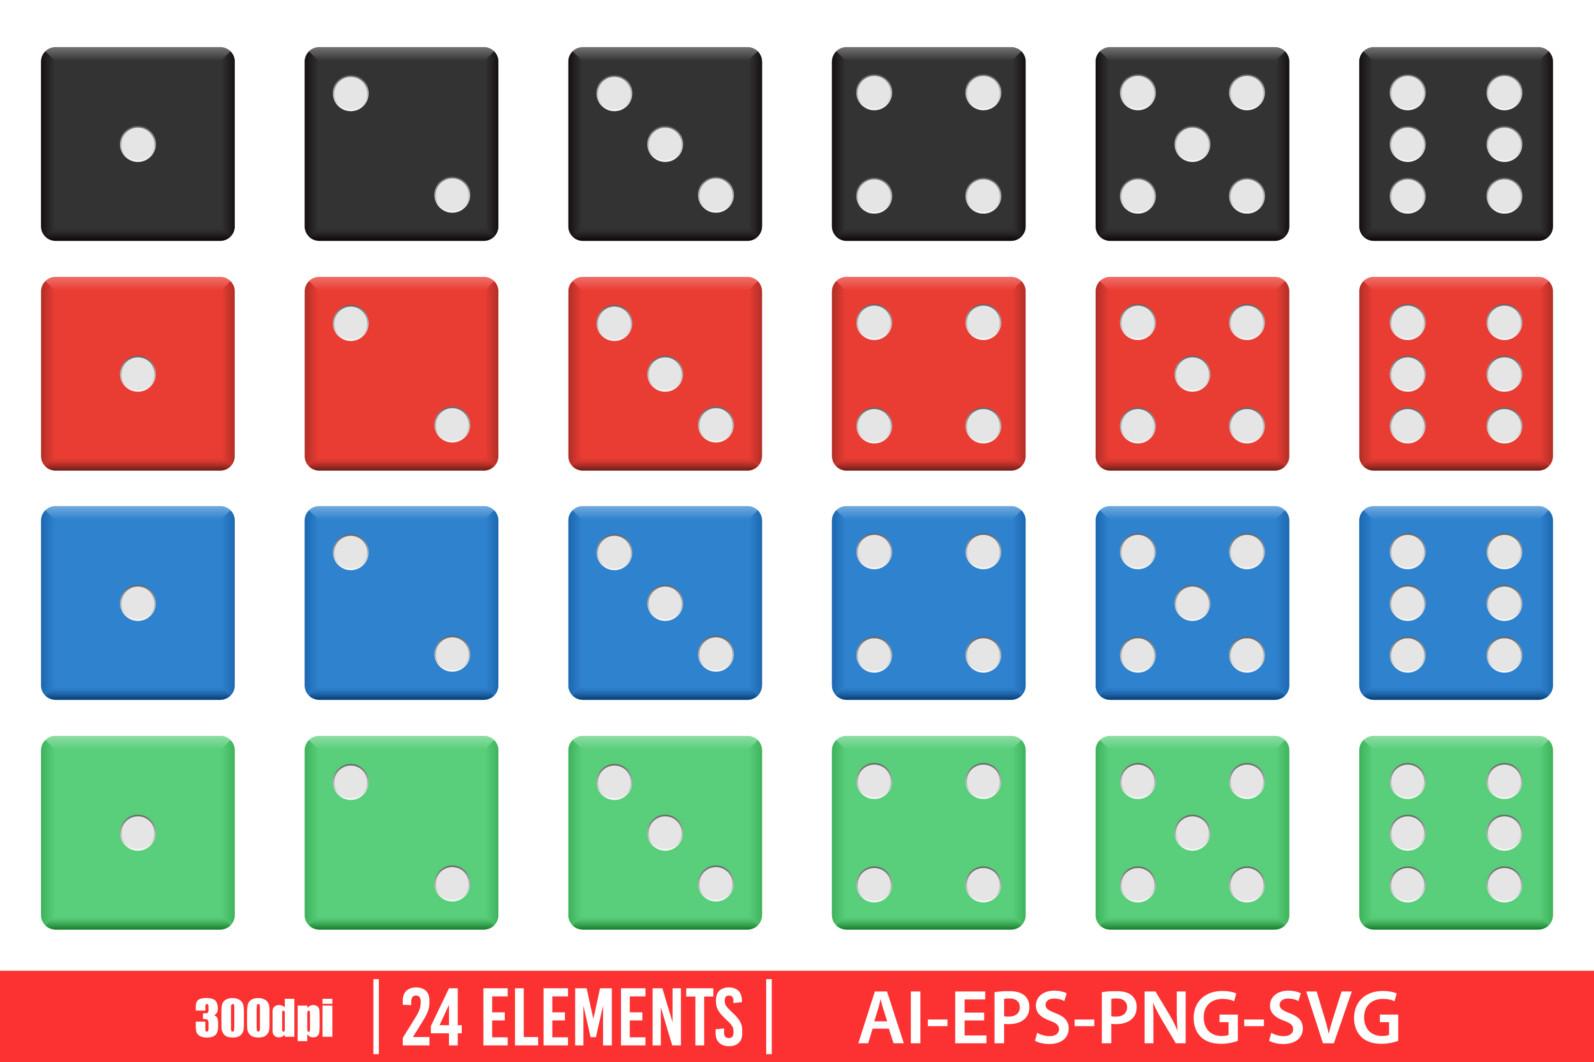 Casino dice clipart vector design illustration. Dice set. Vector Clipart Print - DICE1 scaled -